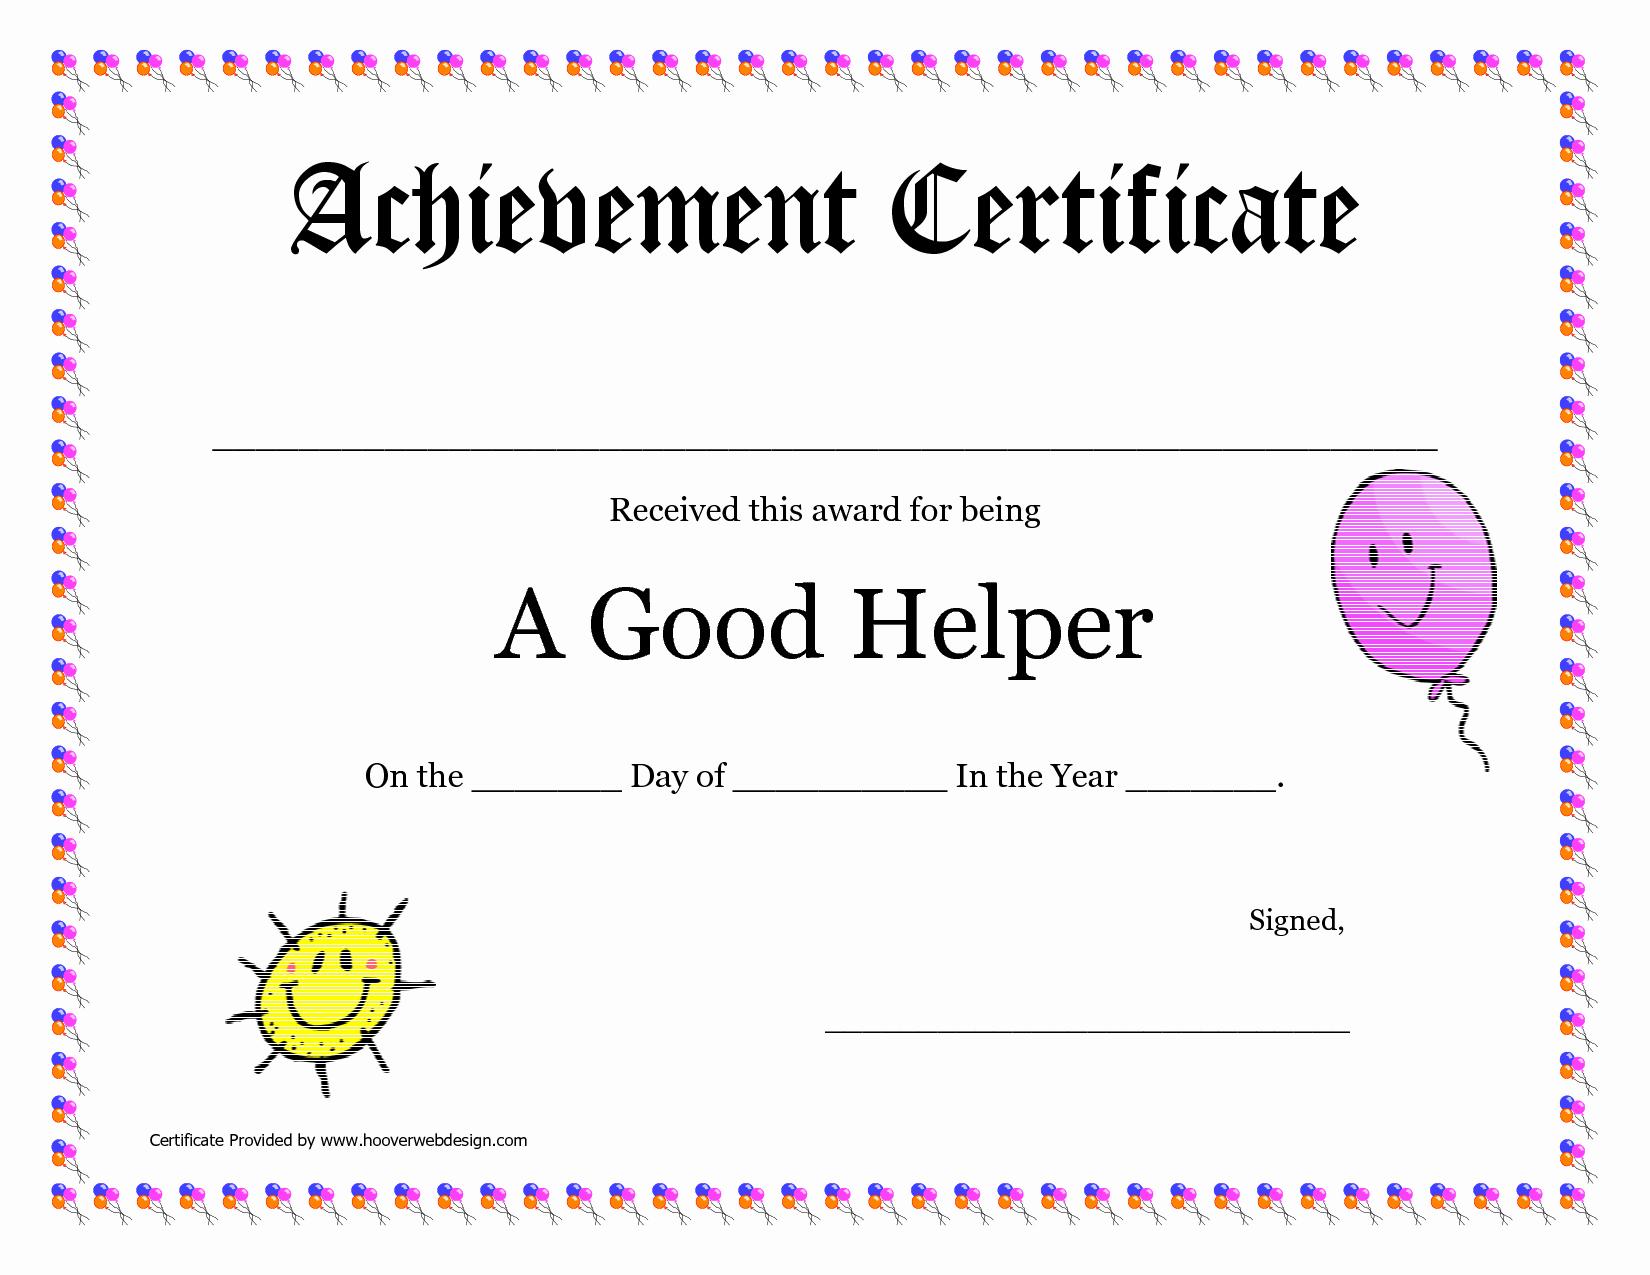 Free Printable Award Certificates New Printable Award Certificates for Teachers